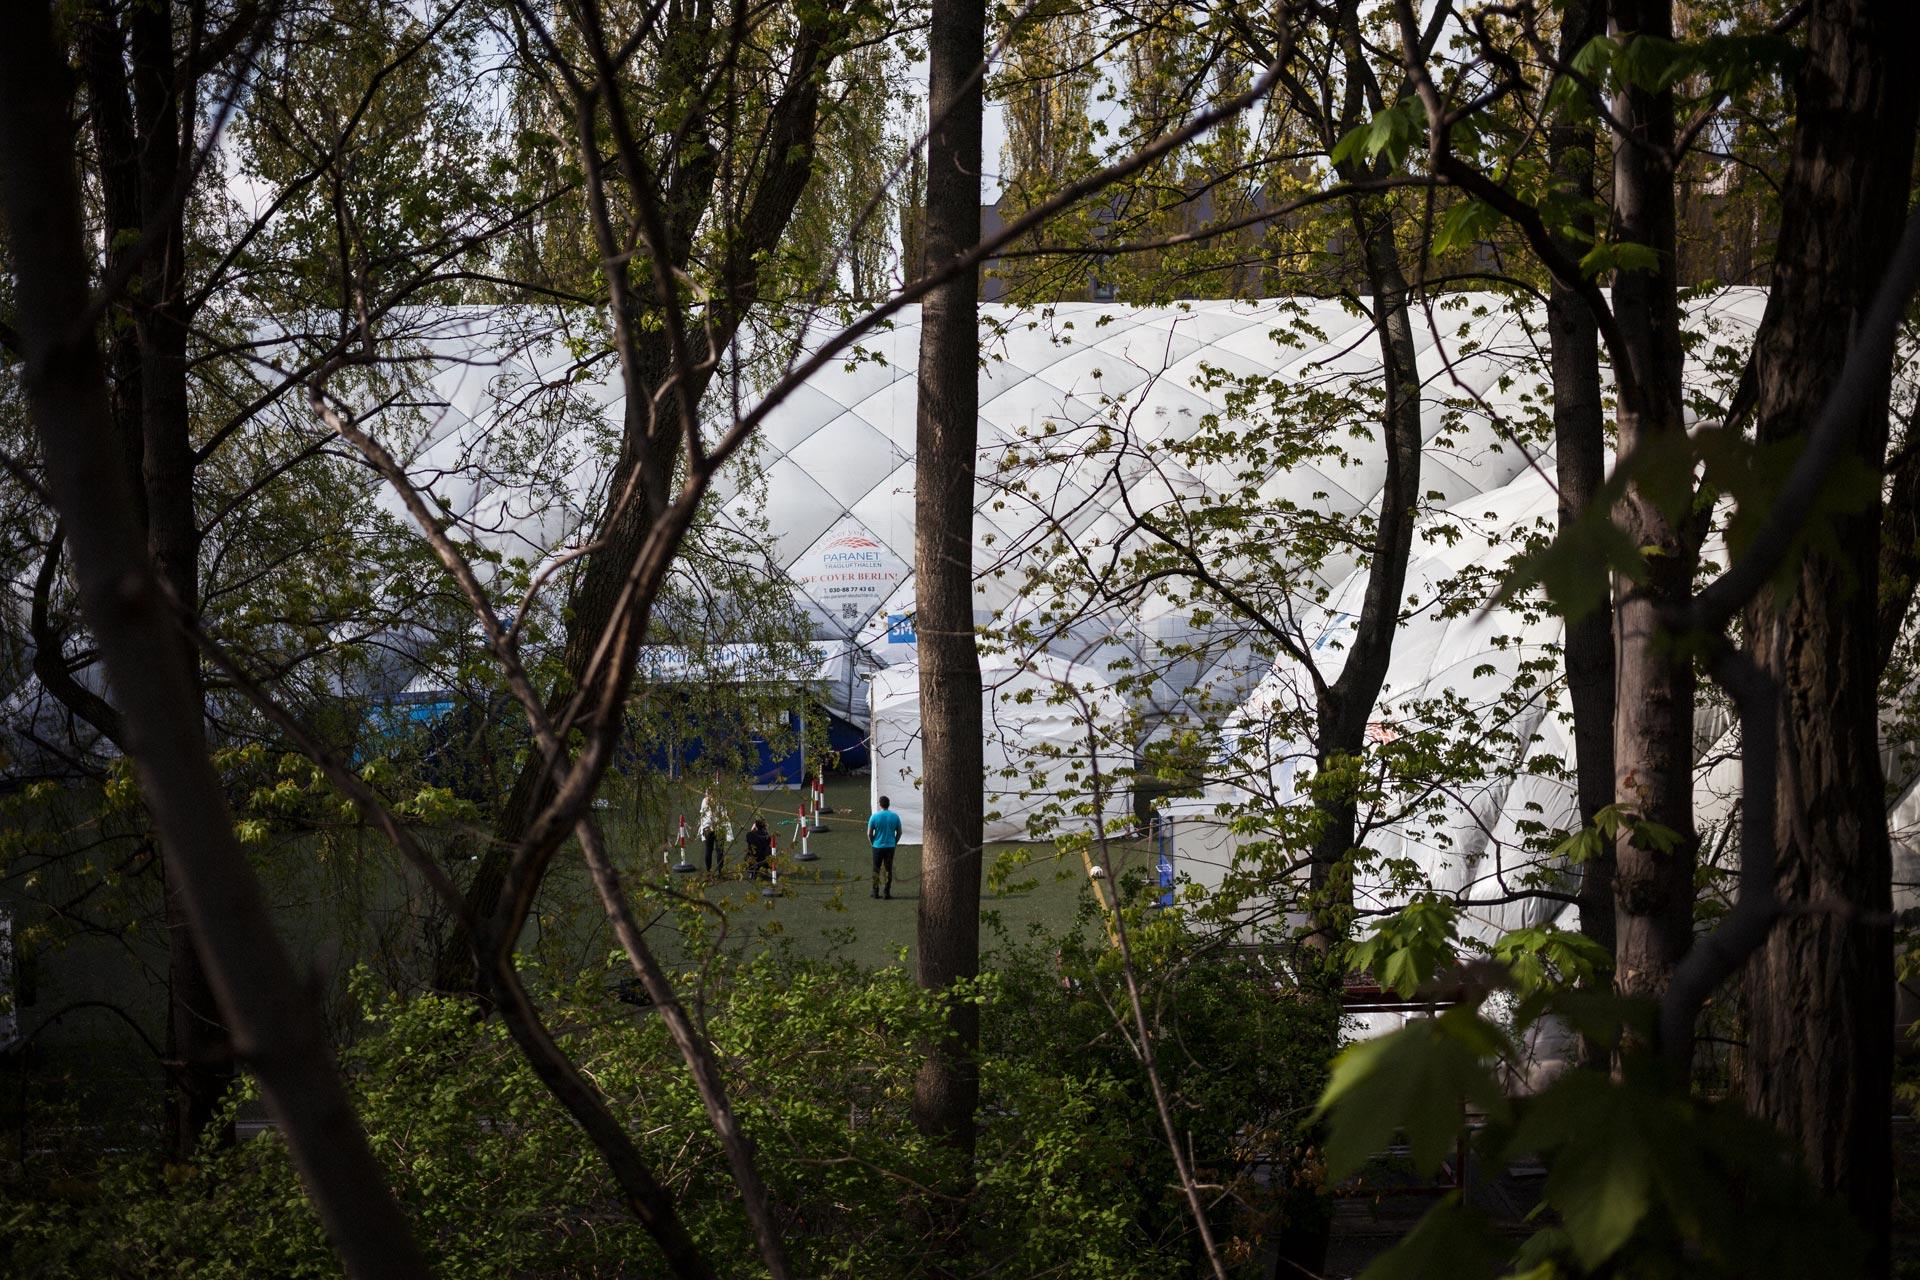 timo-stammberger-photography-fluechtlinge-refugees-berlin-migration-notunterkunft_01